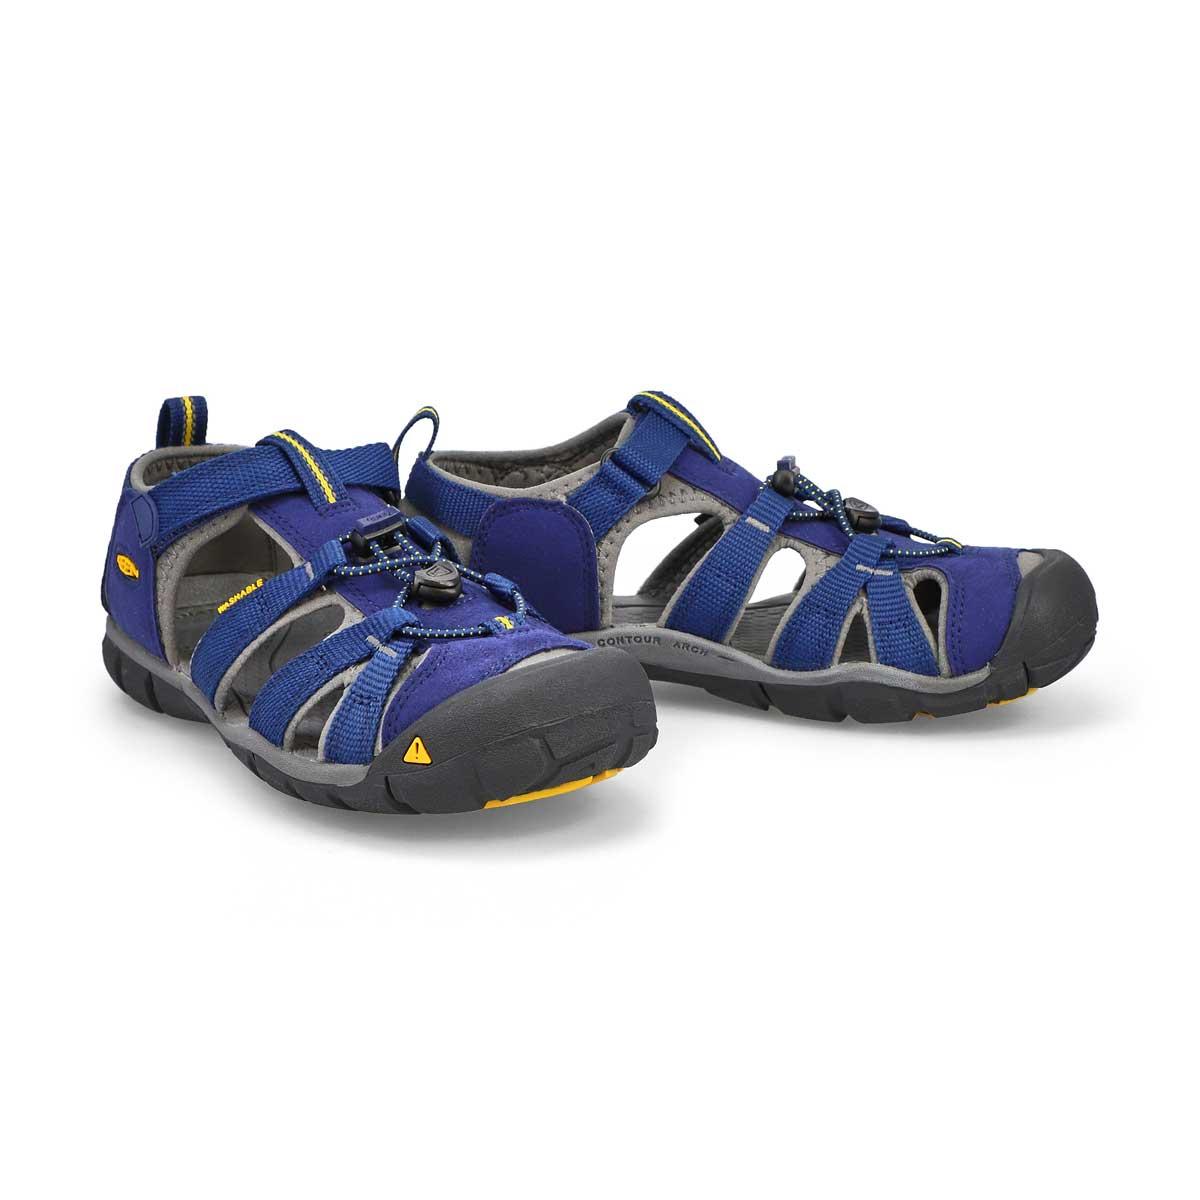 Boys' Seacamp II CNX Sport Sandal - Blue/Grgoyl